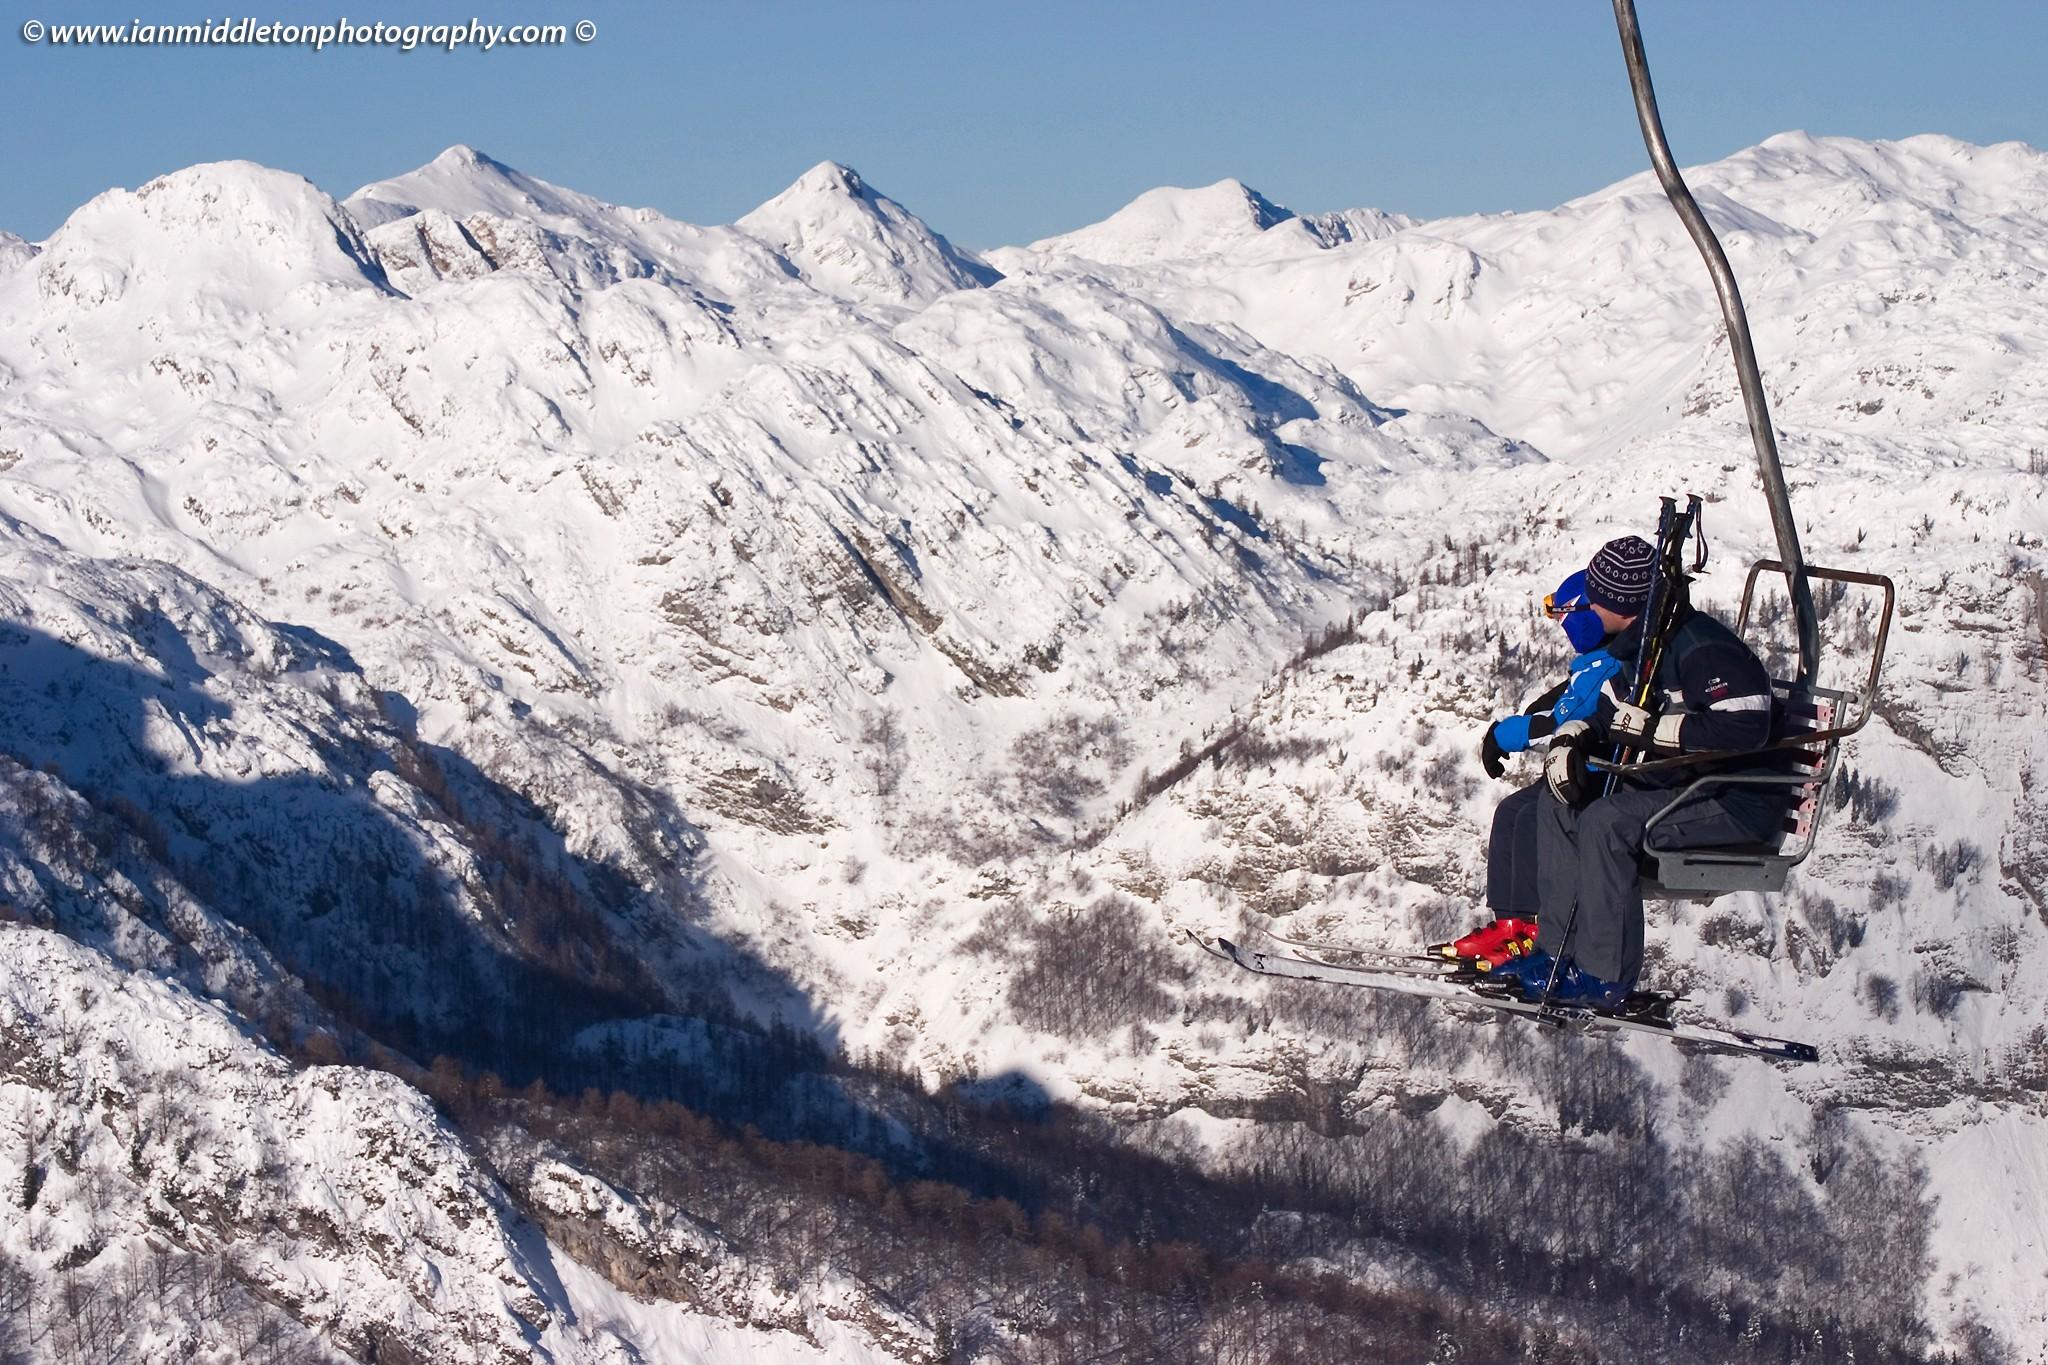 Skiers on chairlift at Vogel Ski resort in Slovenia.